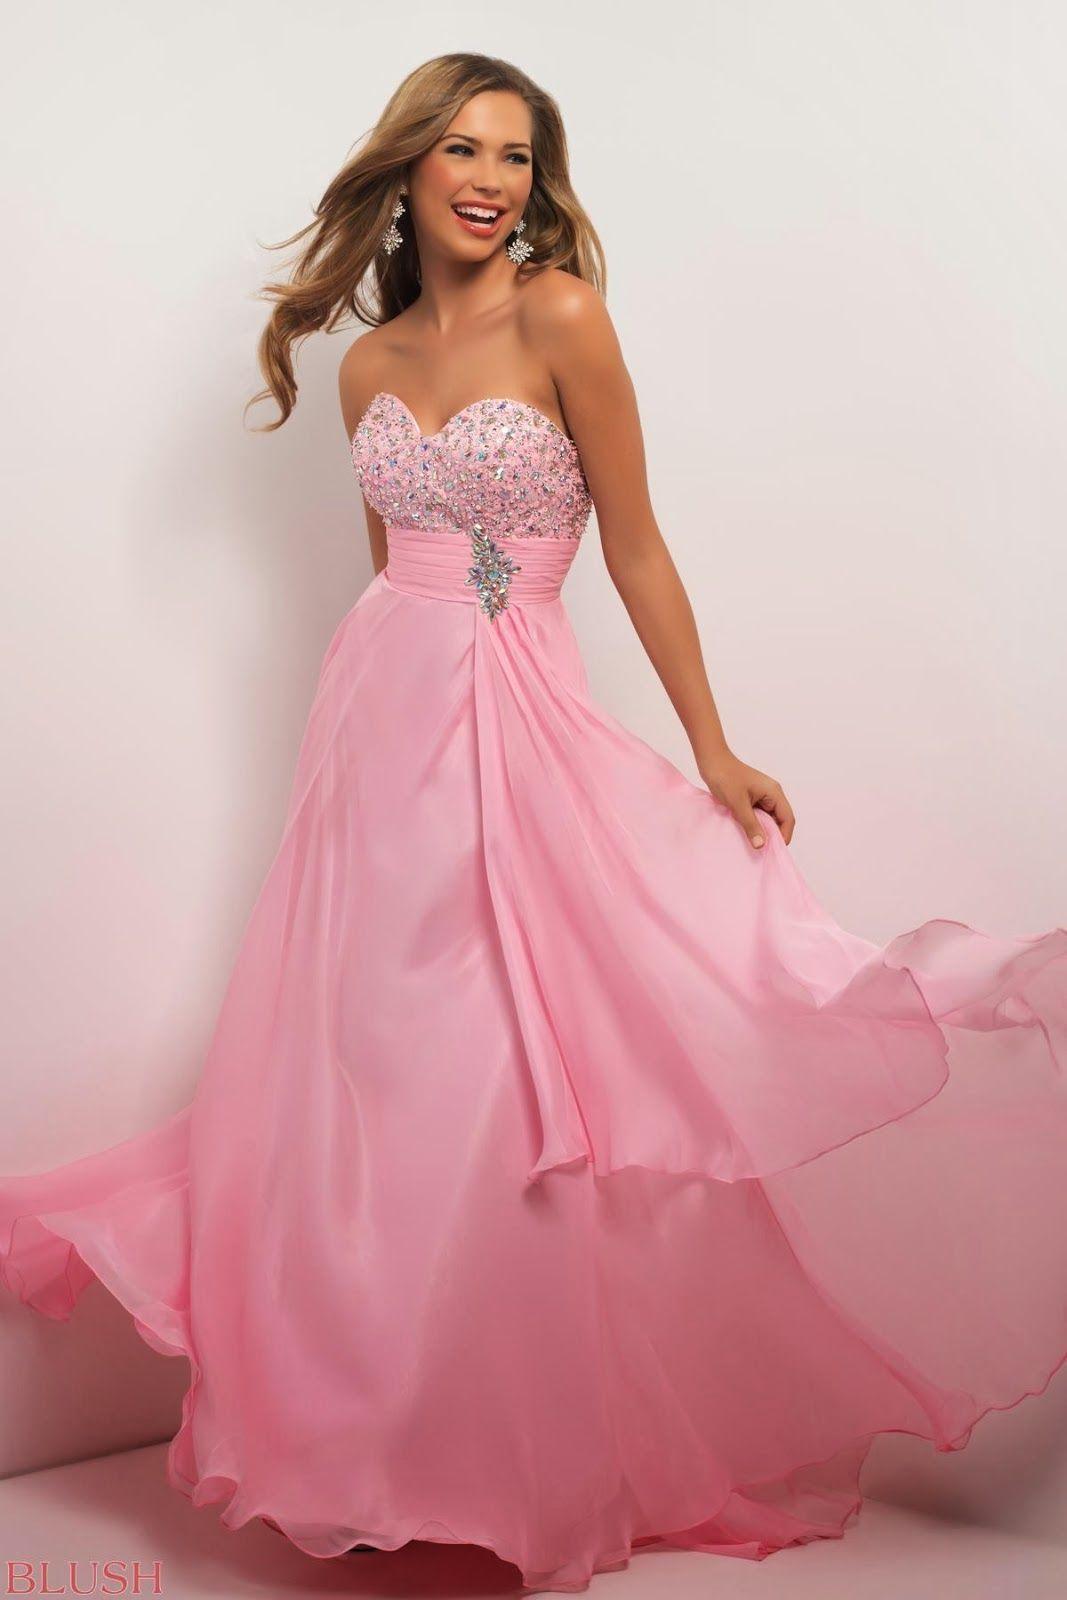 vestidos-rosa-volados-juvenil | Dresses / Fashion | Pinterest